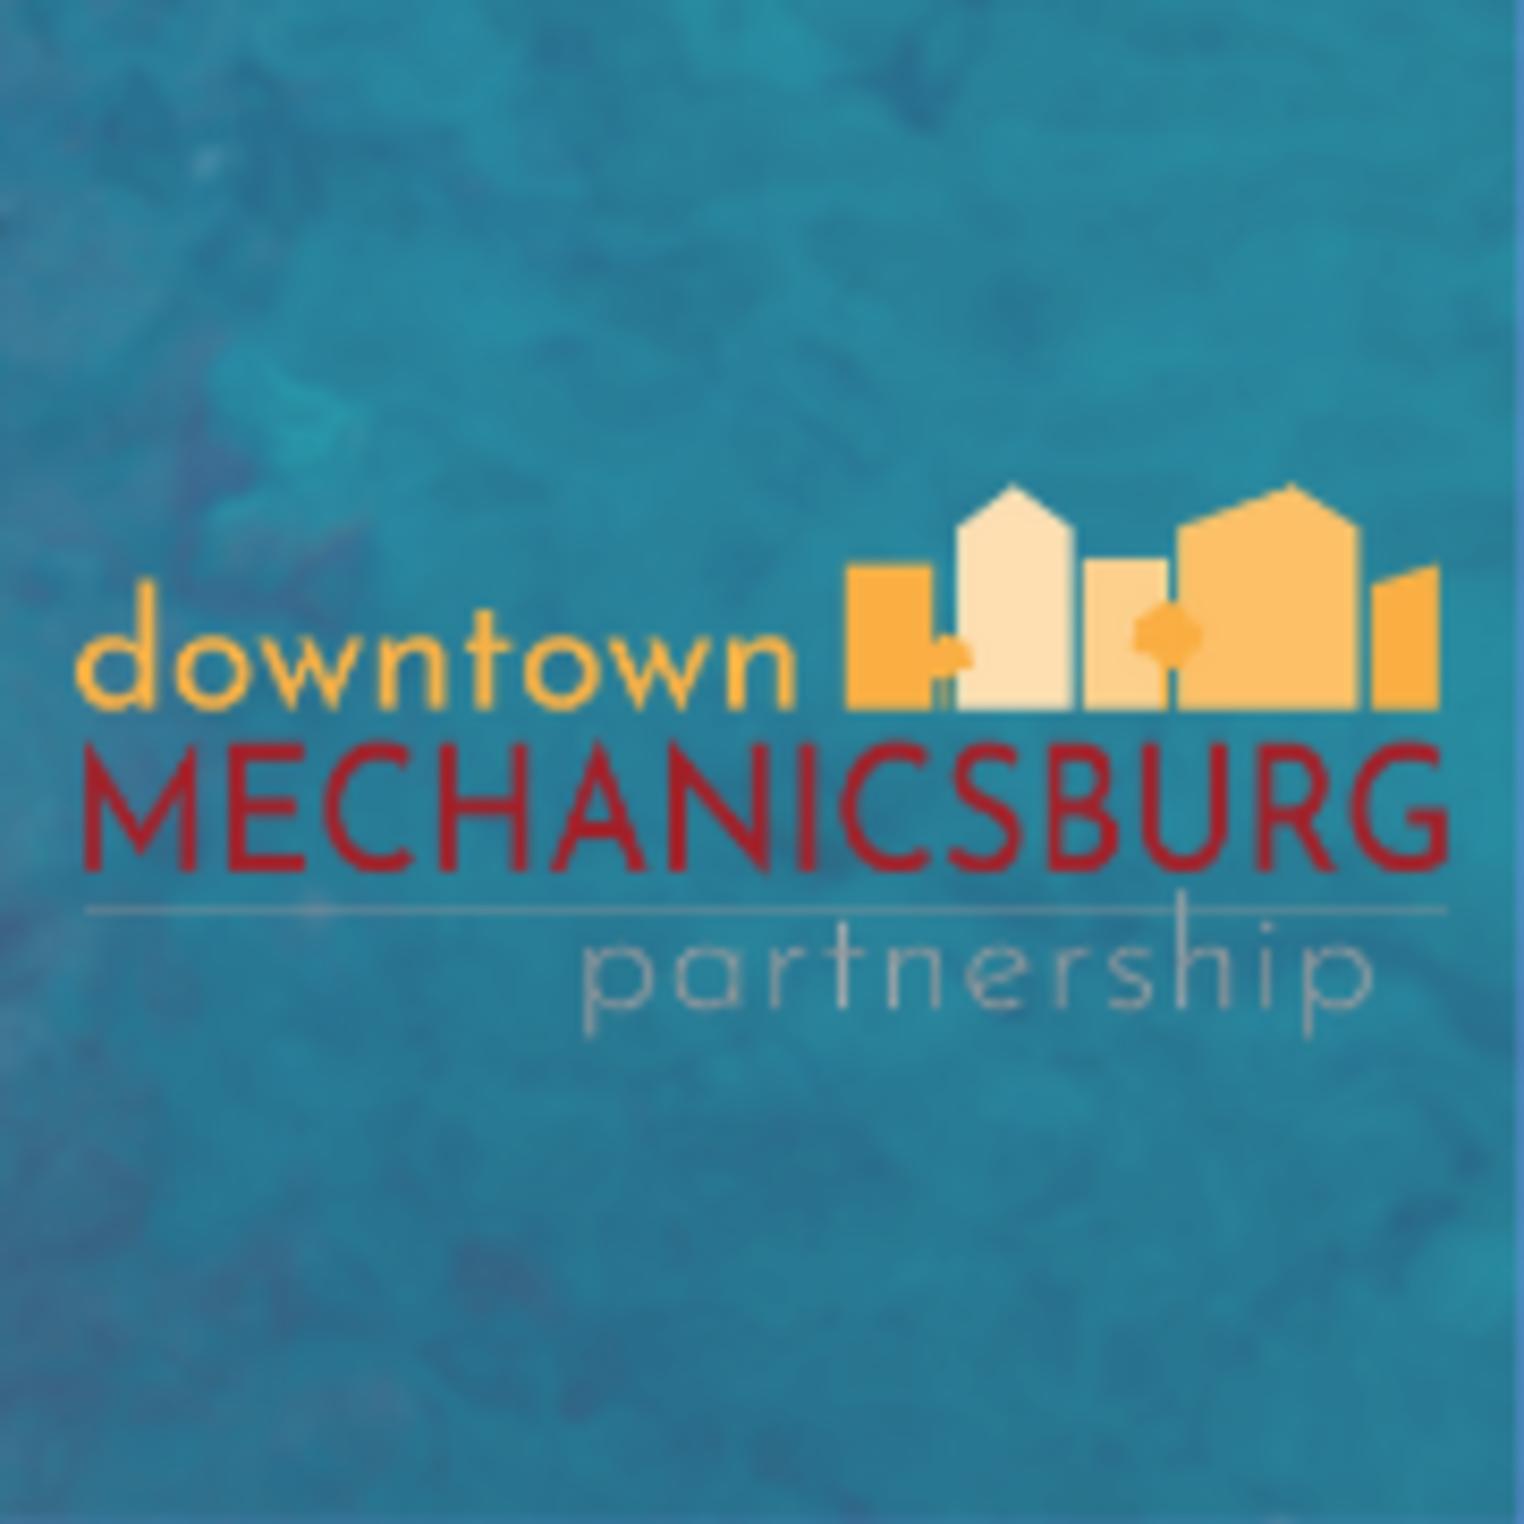 Downtown Mechanicsburg Partnership